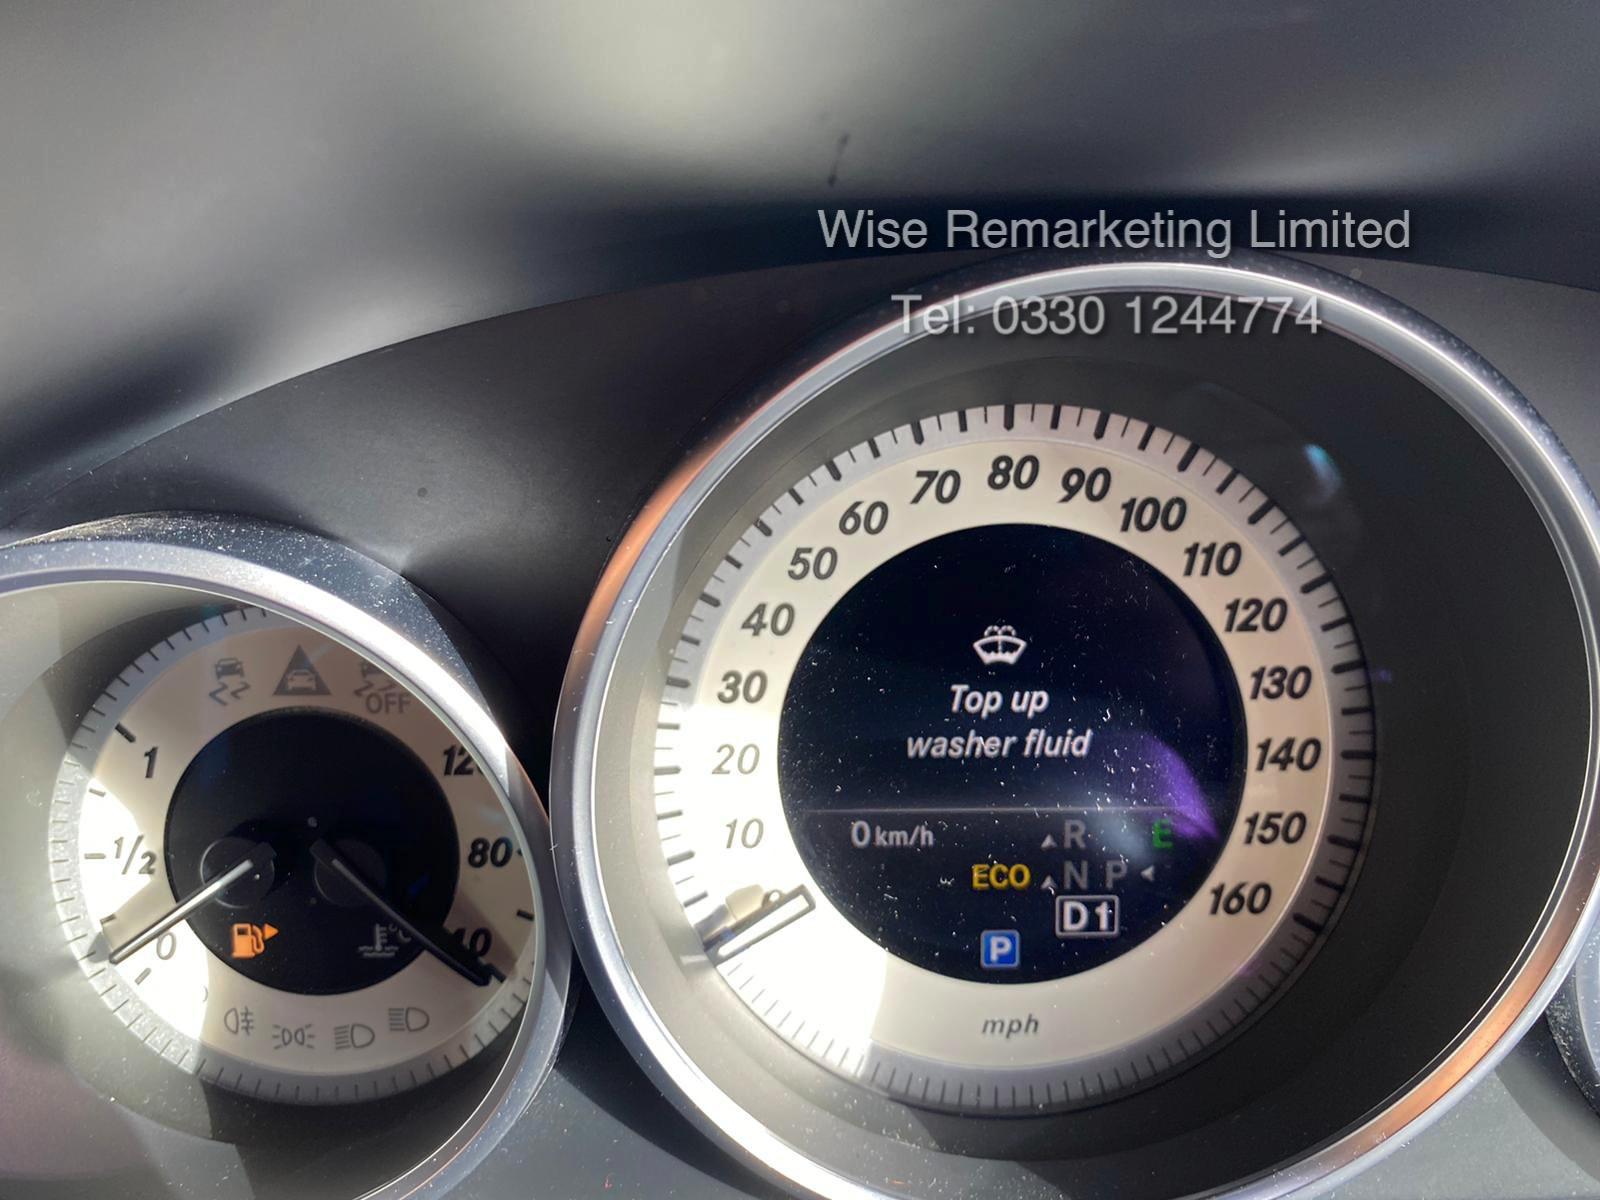 Mercedes E220d 2.1 Special Equipment Auto 2015 15 Reg - 1 Former Keeper - Sat Nav - Parking Sensors - Image 14 of 14